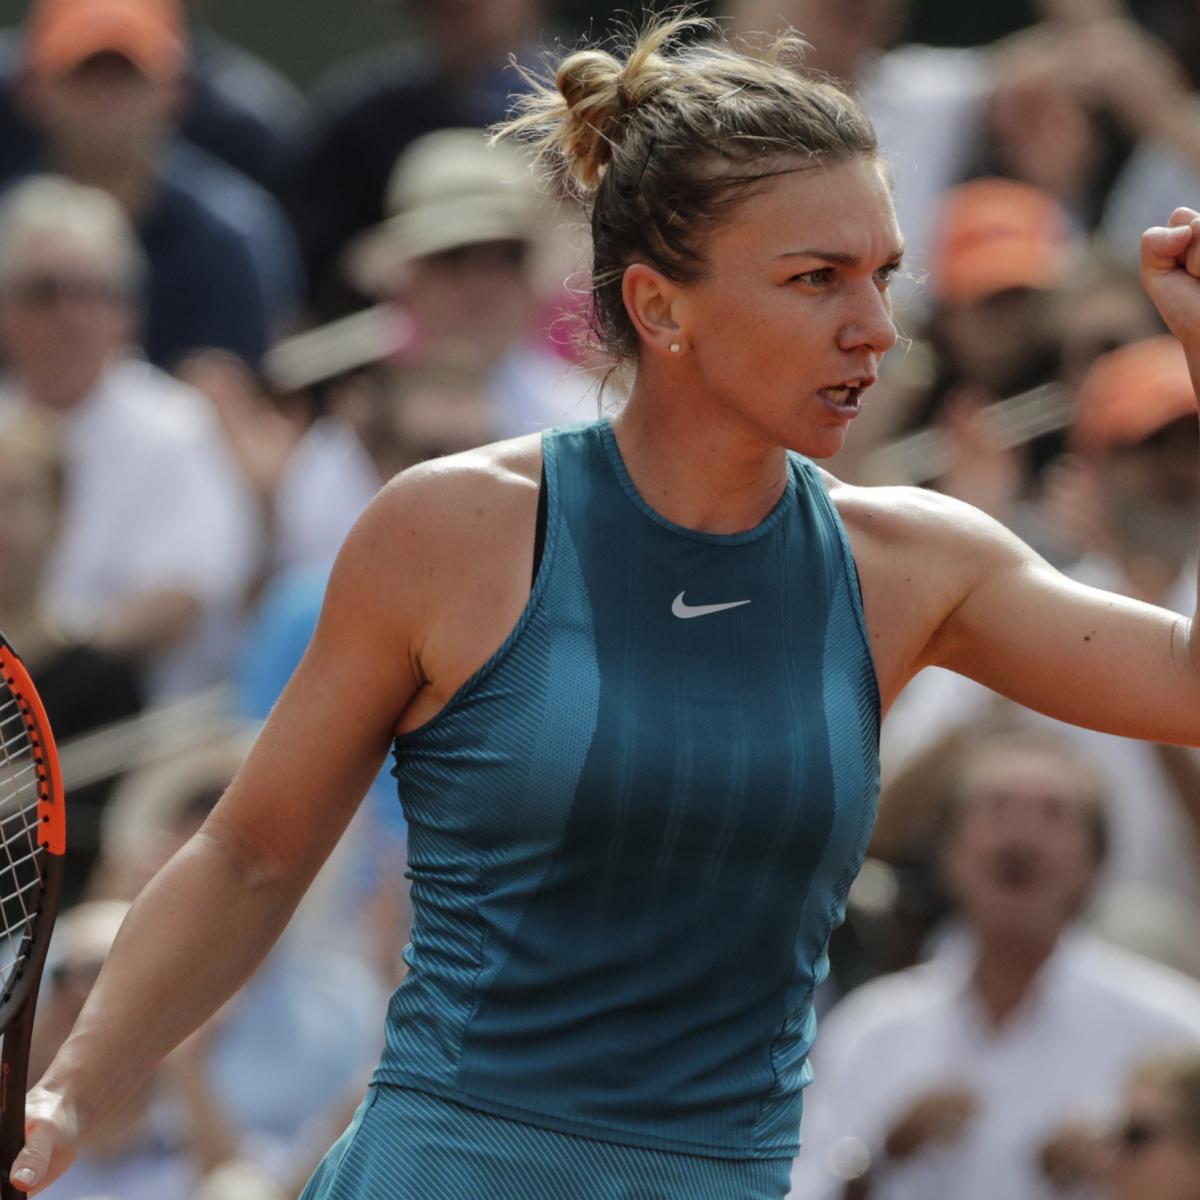 Simona Halep Beats Sloane Stephens to Win 2018 French Open Women's Final